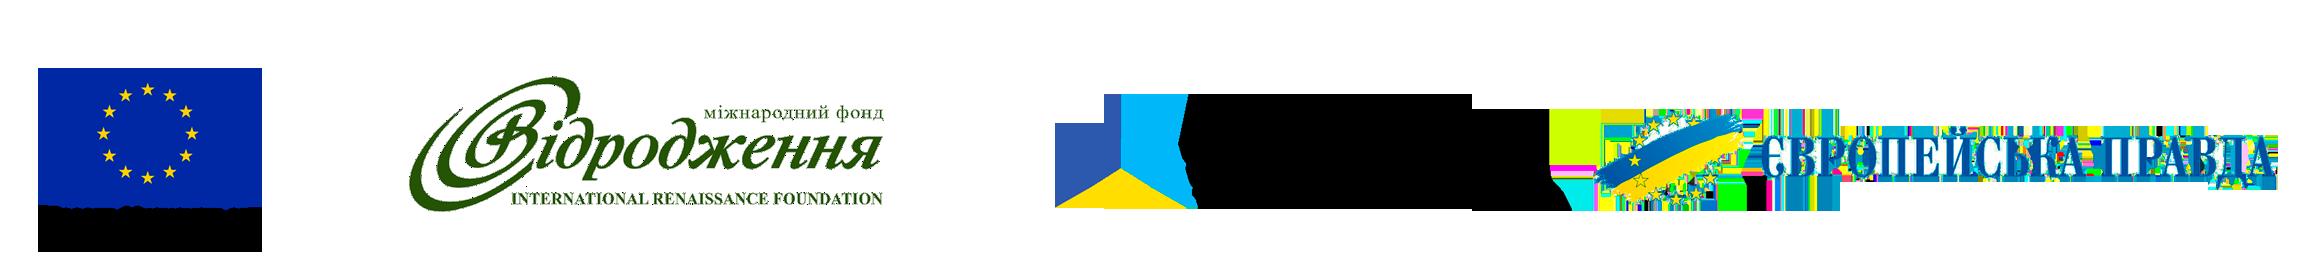 rfr_logo1